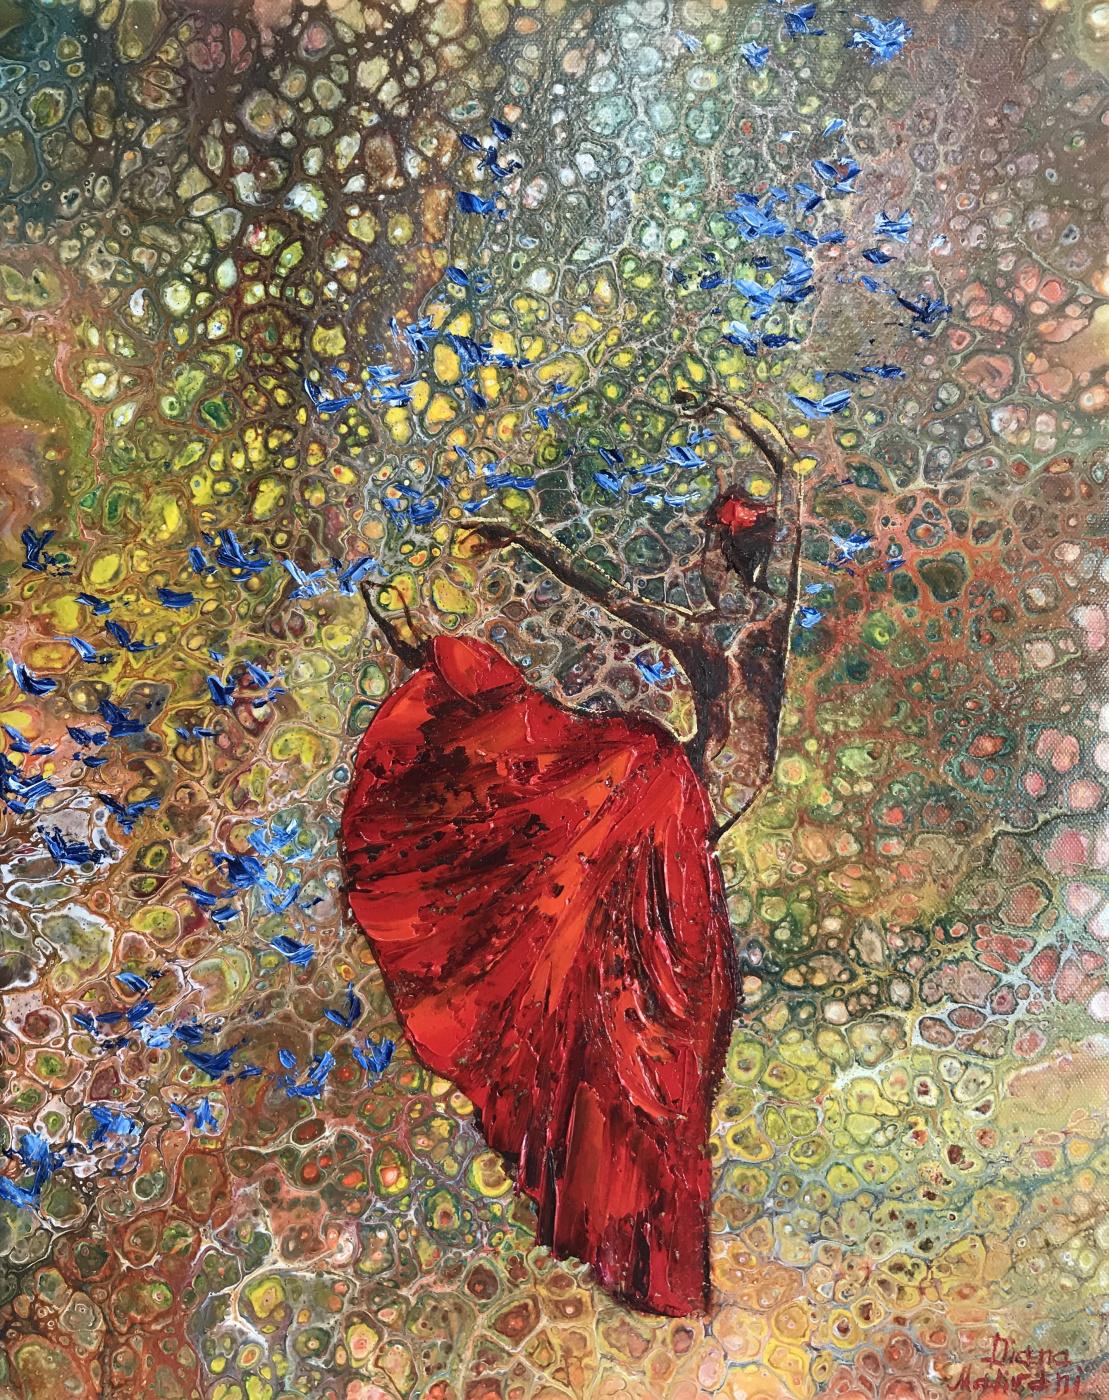 Диана Владимировна Маливани. She Who Dances